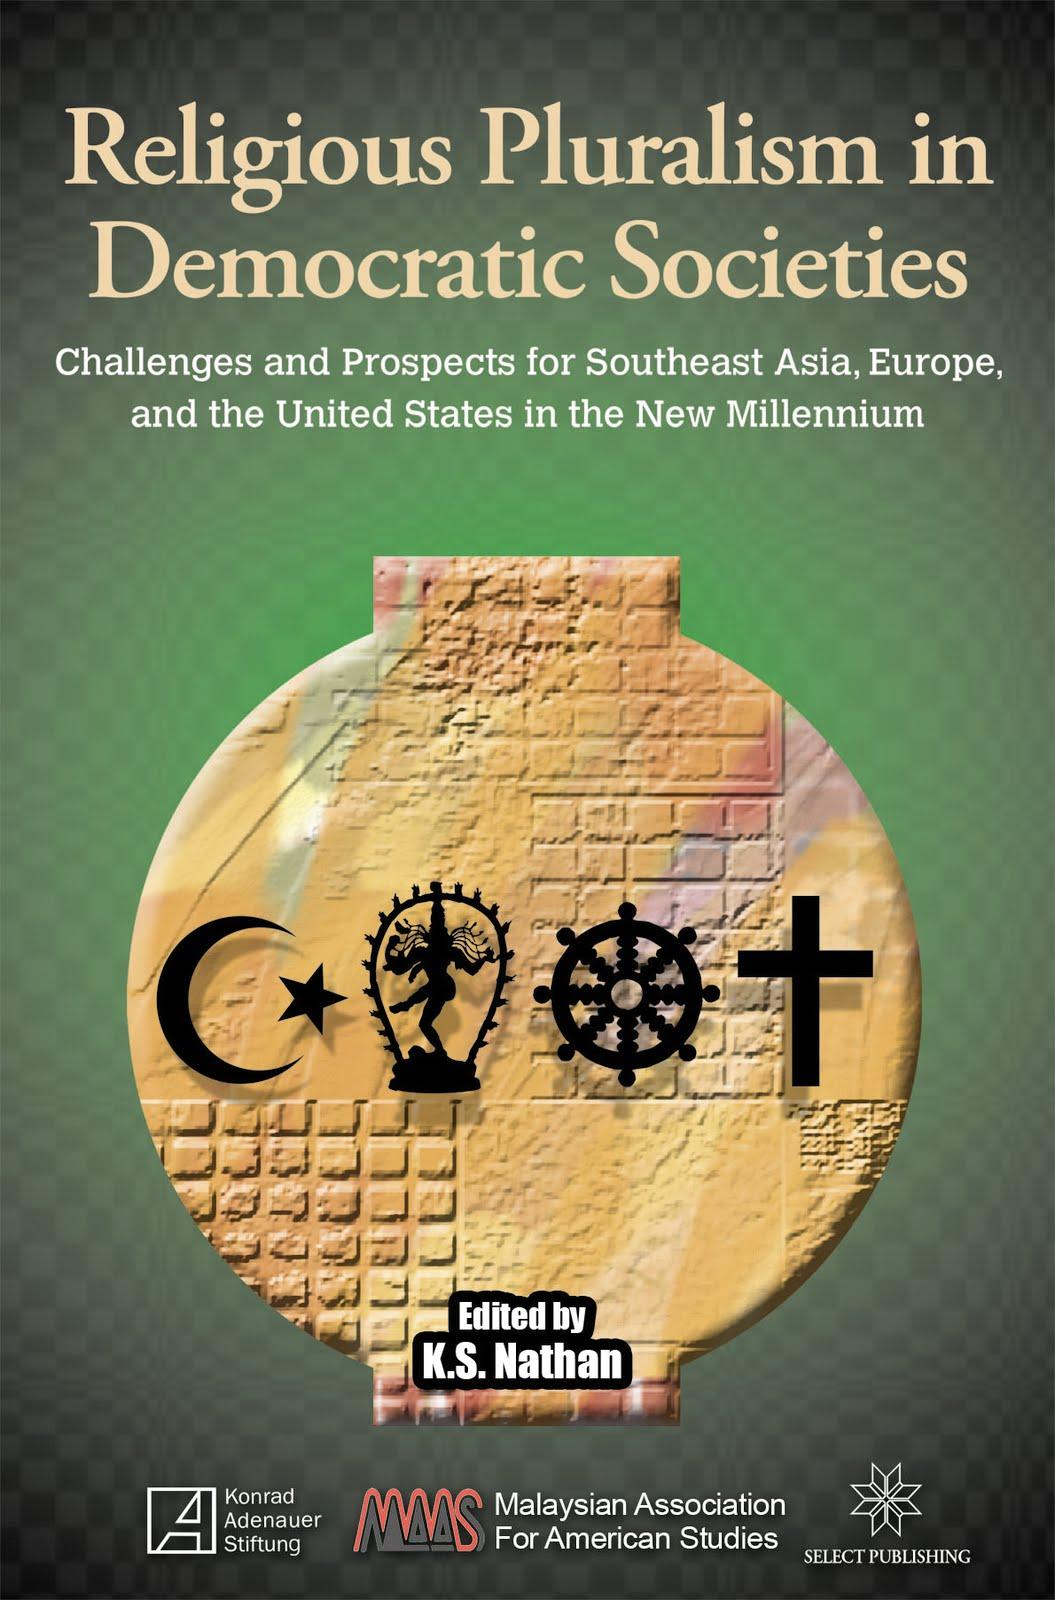 The Good of Religious Pluralism